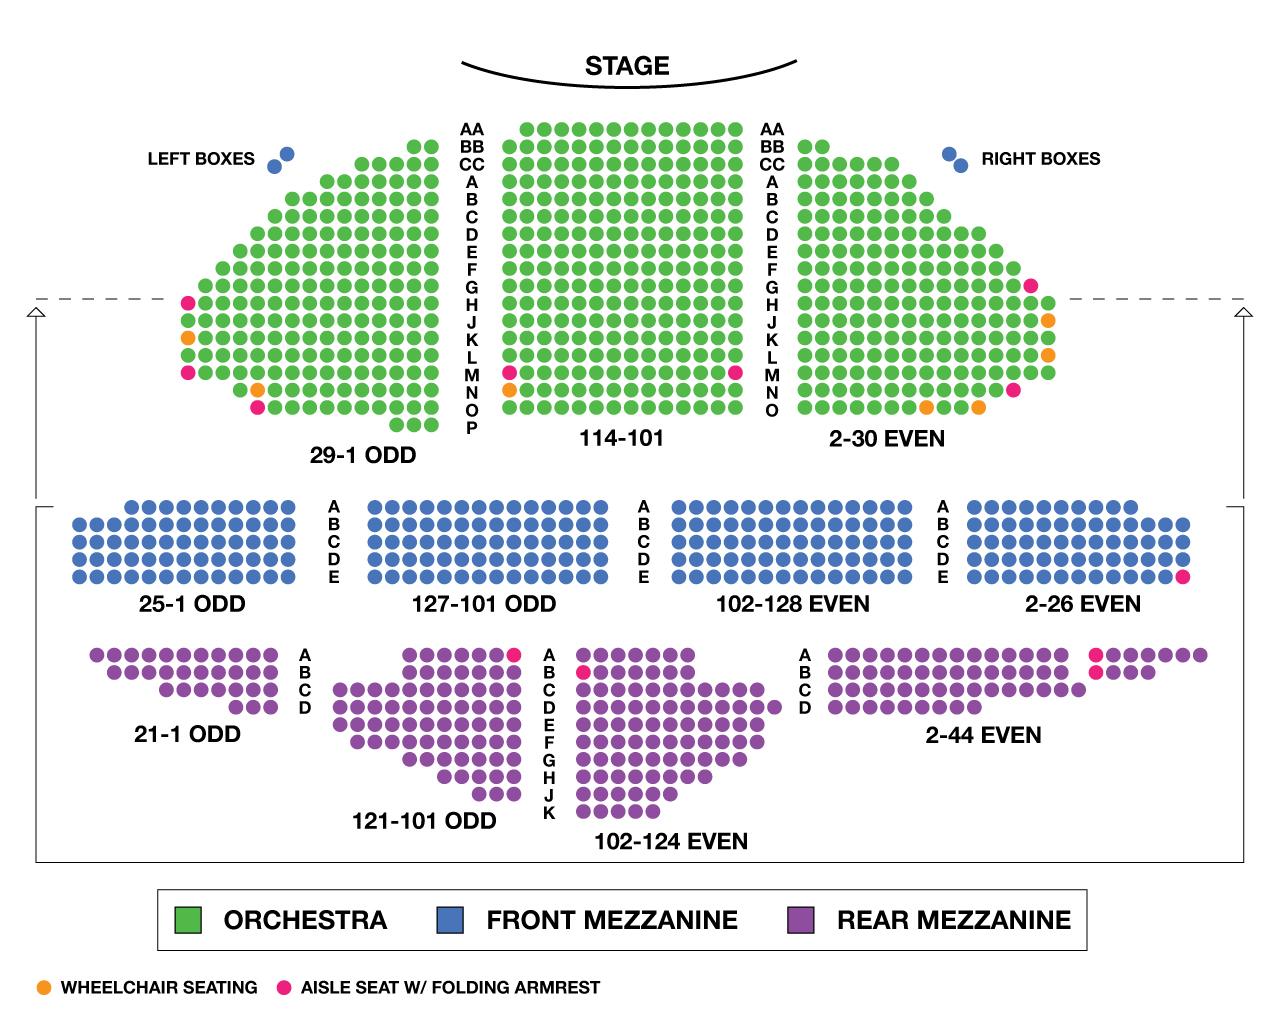 Ambassador Theatre Broadway Seating Chart Large